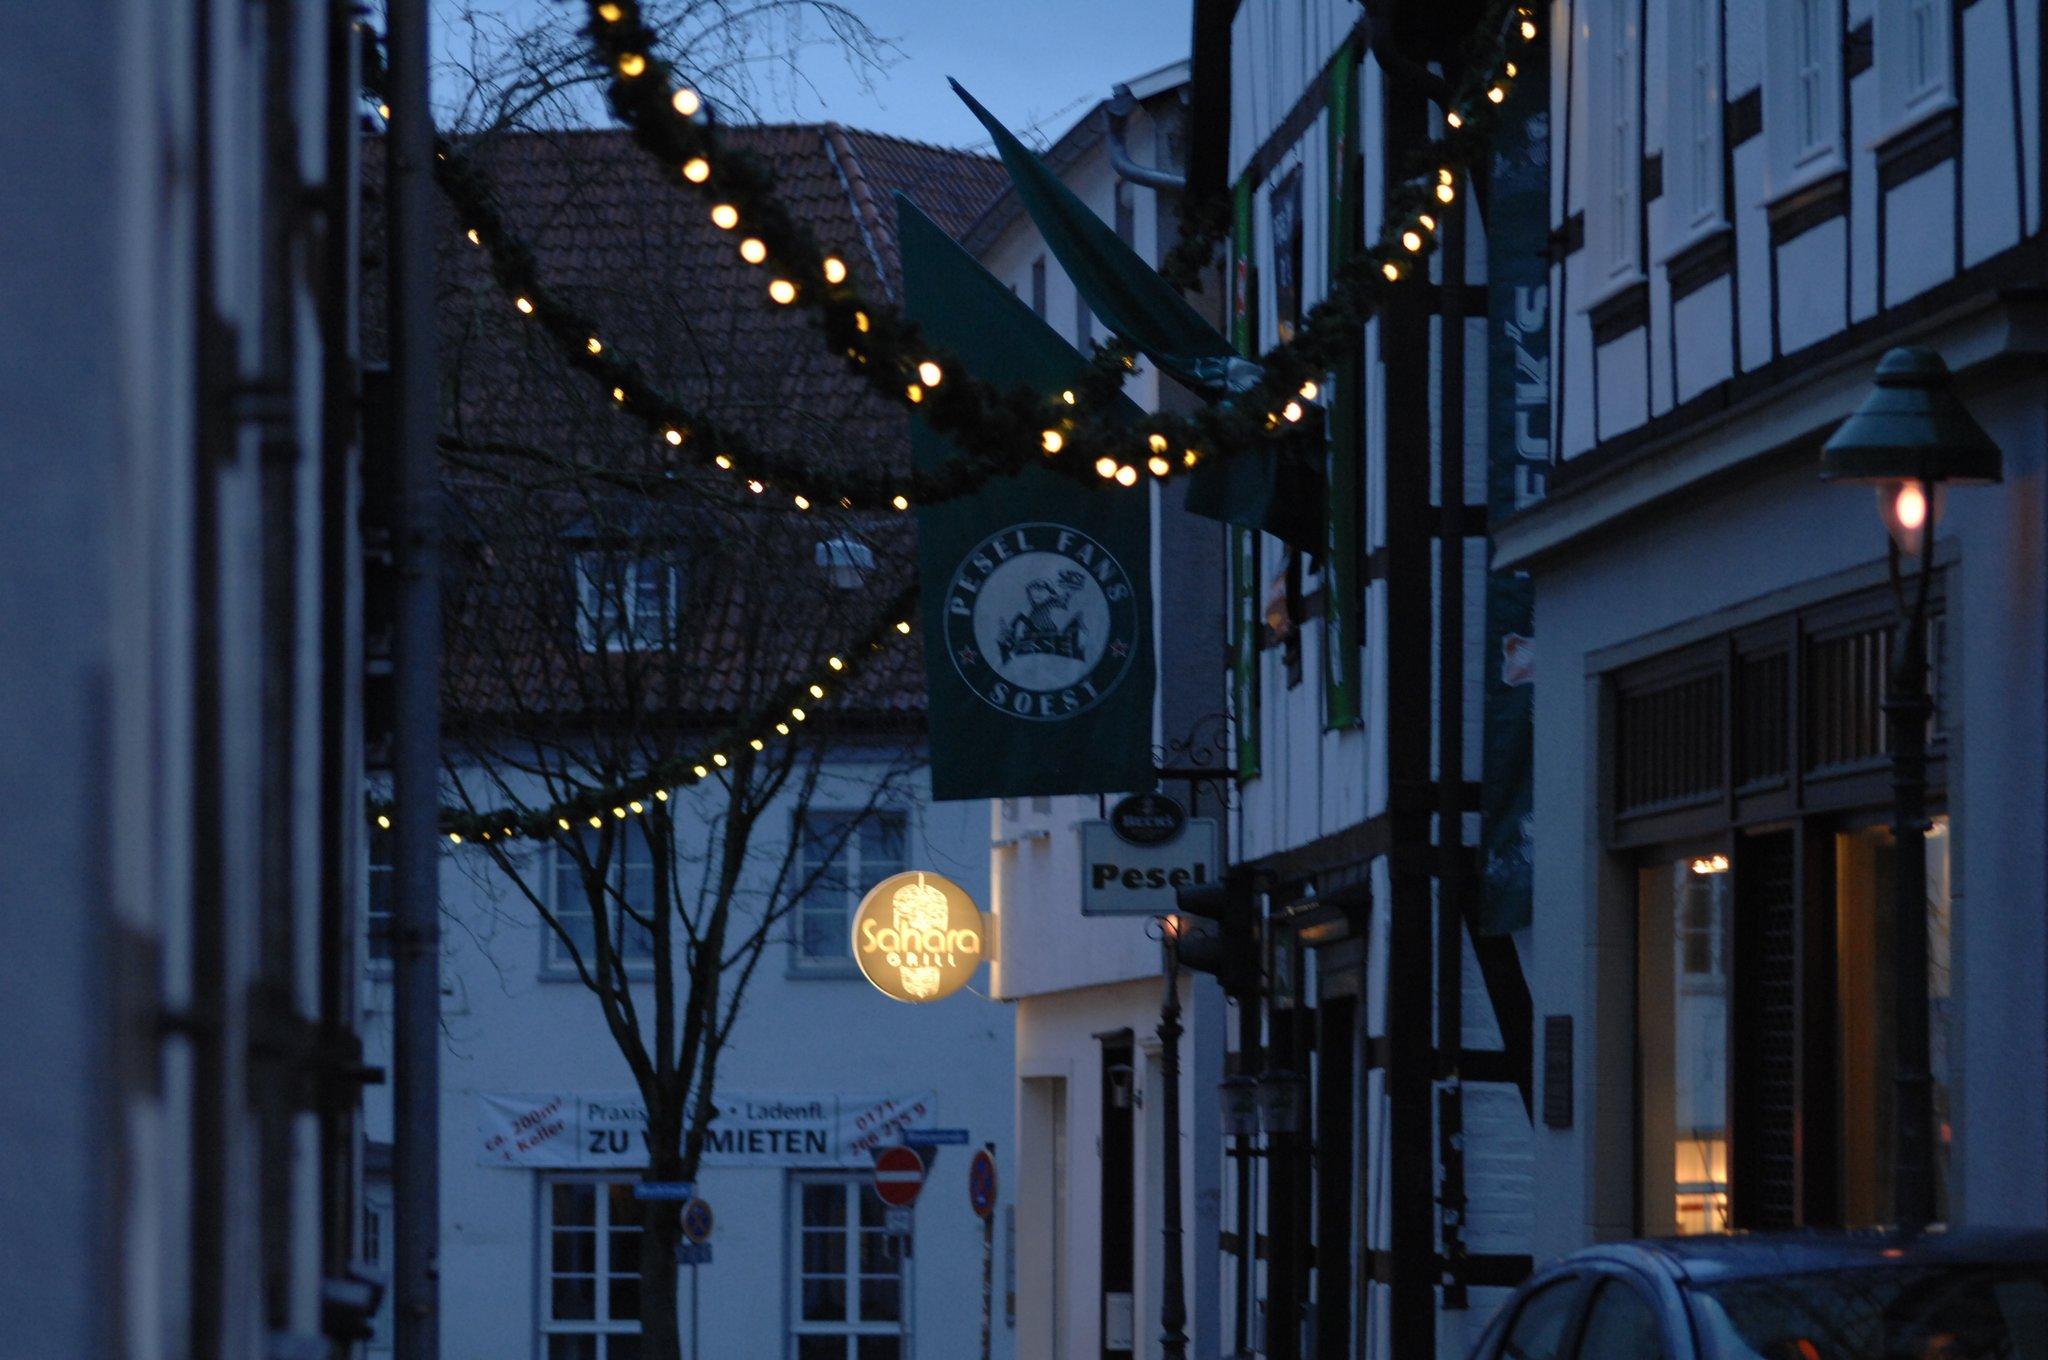 Soest Weihnachtsmarkt.Soest Weihnachtsmarkt 2015 Herne